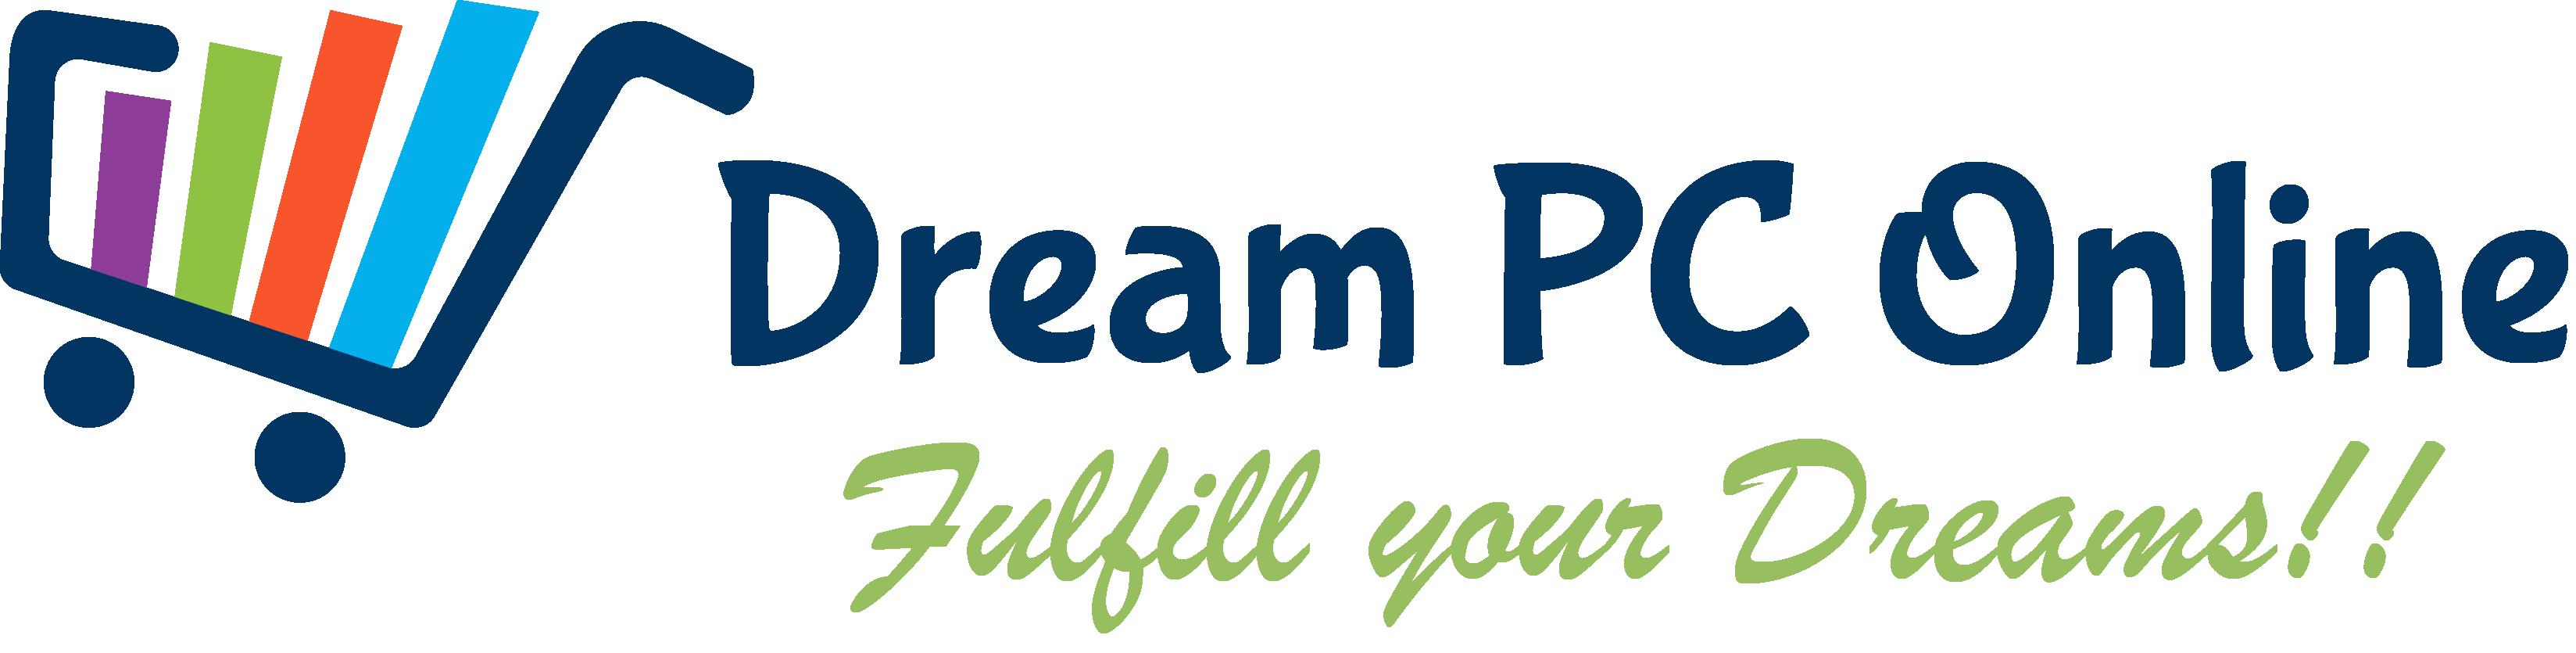 DreamPcOnline